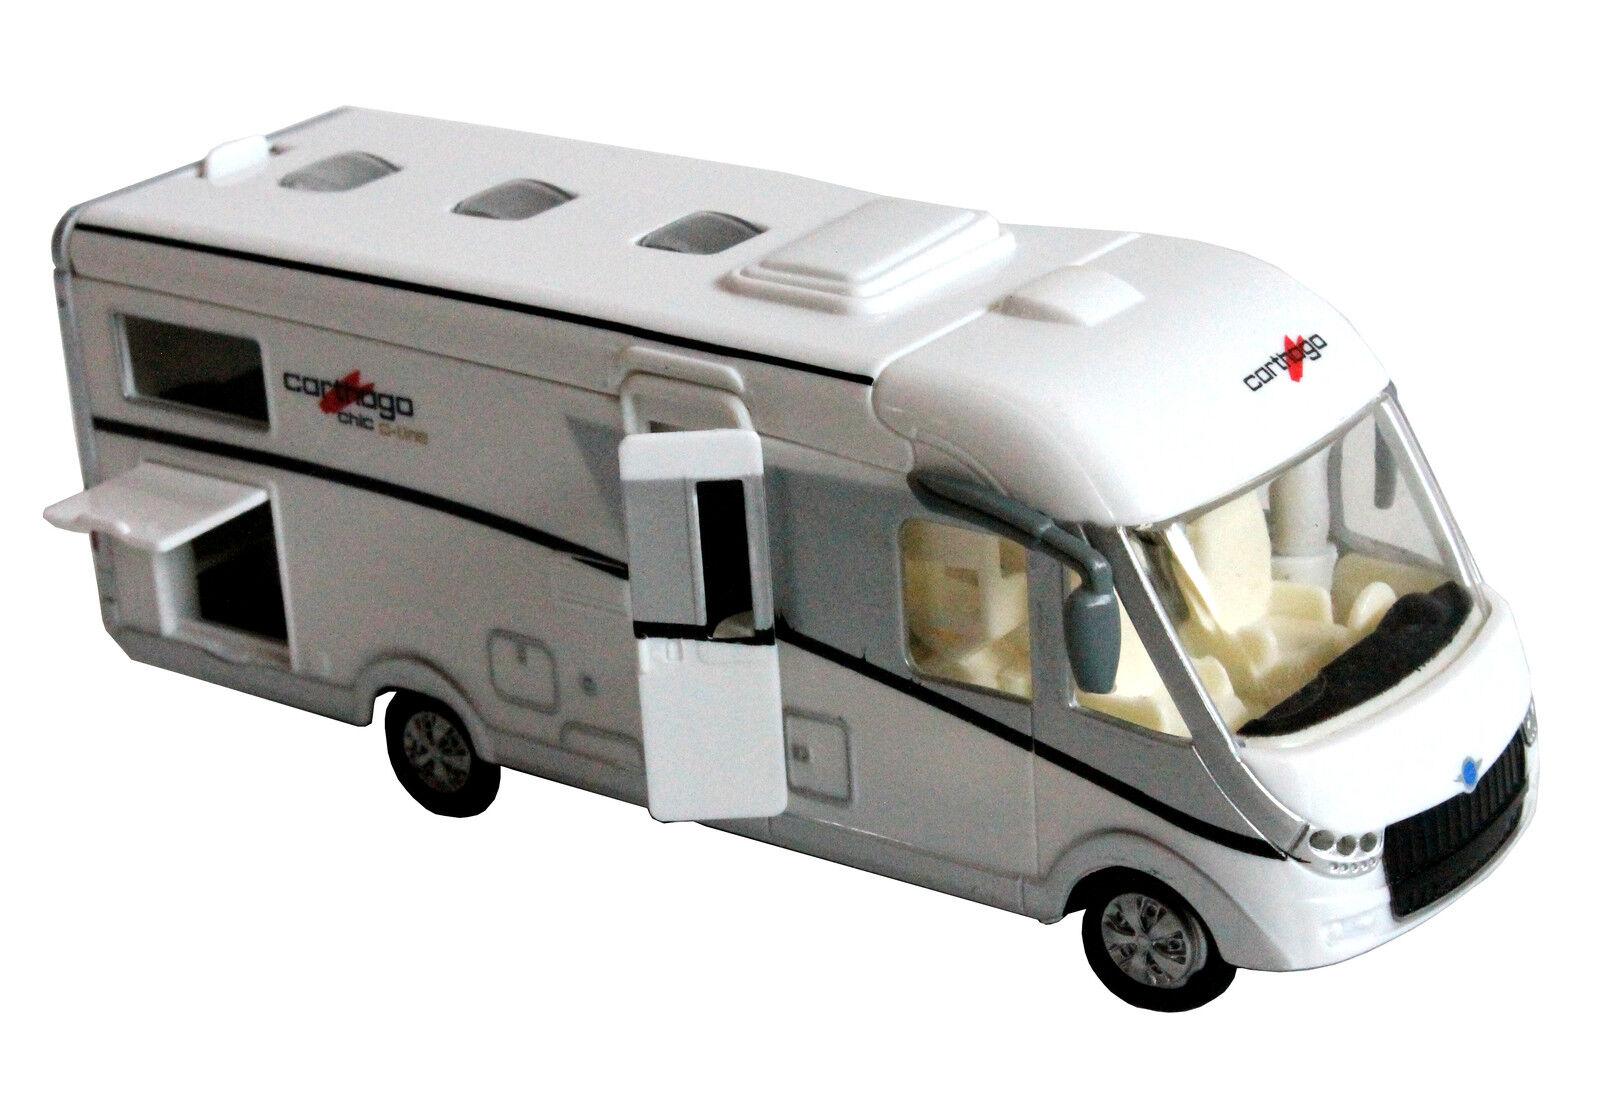 Camping Car Hymer S